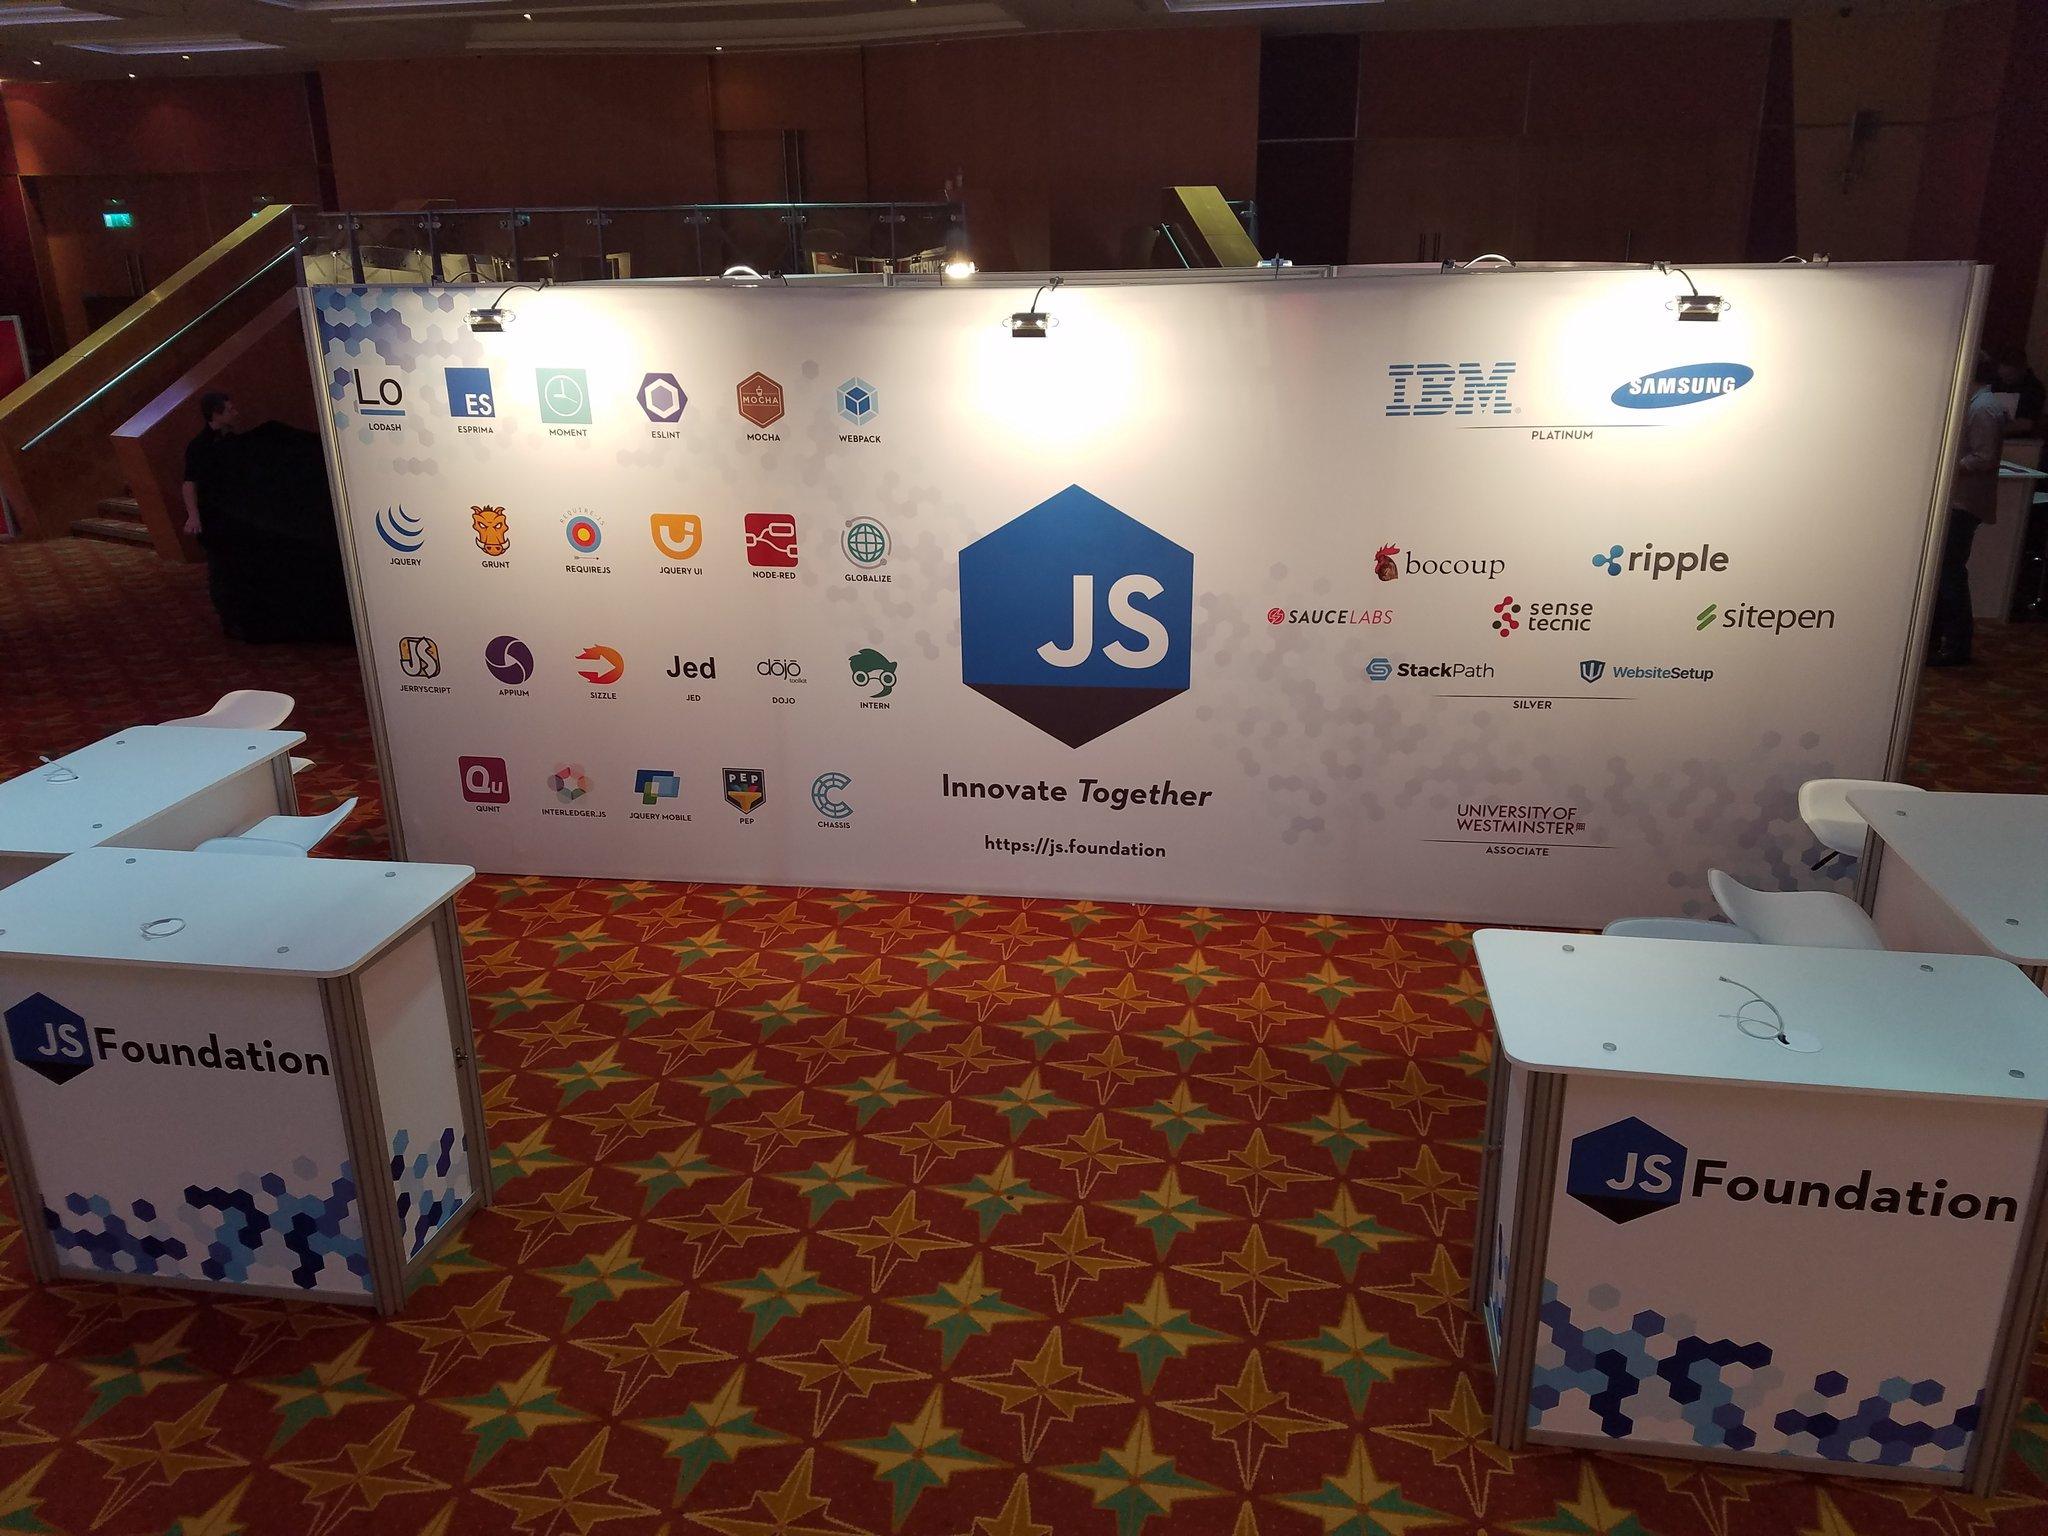 js-foundation-oscon.jpg